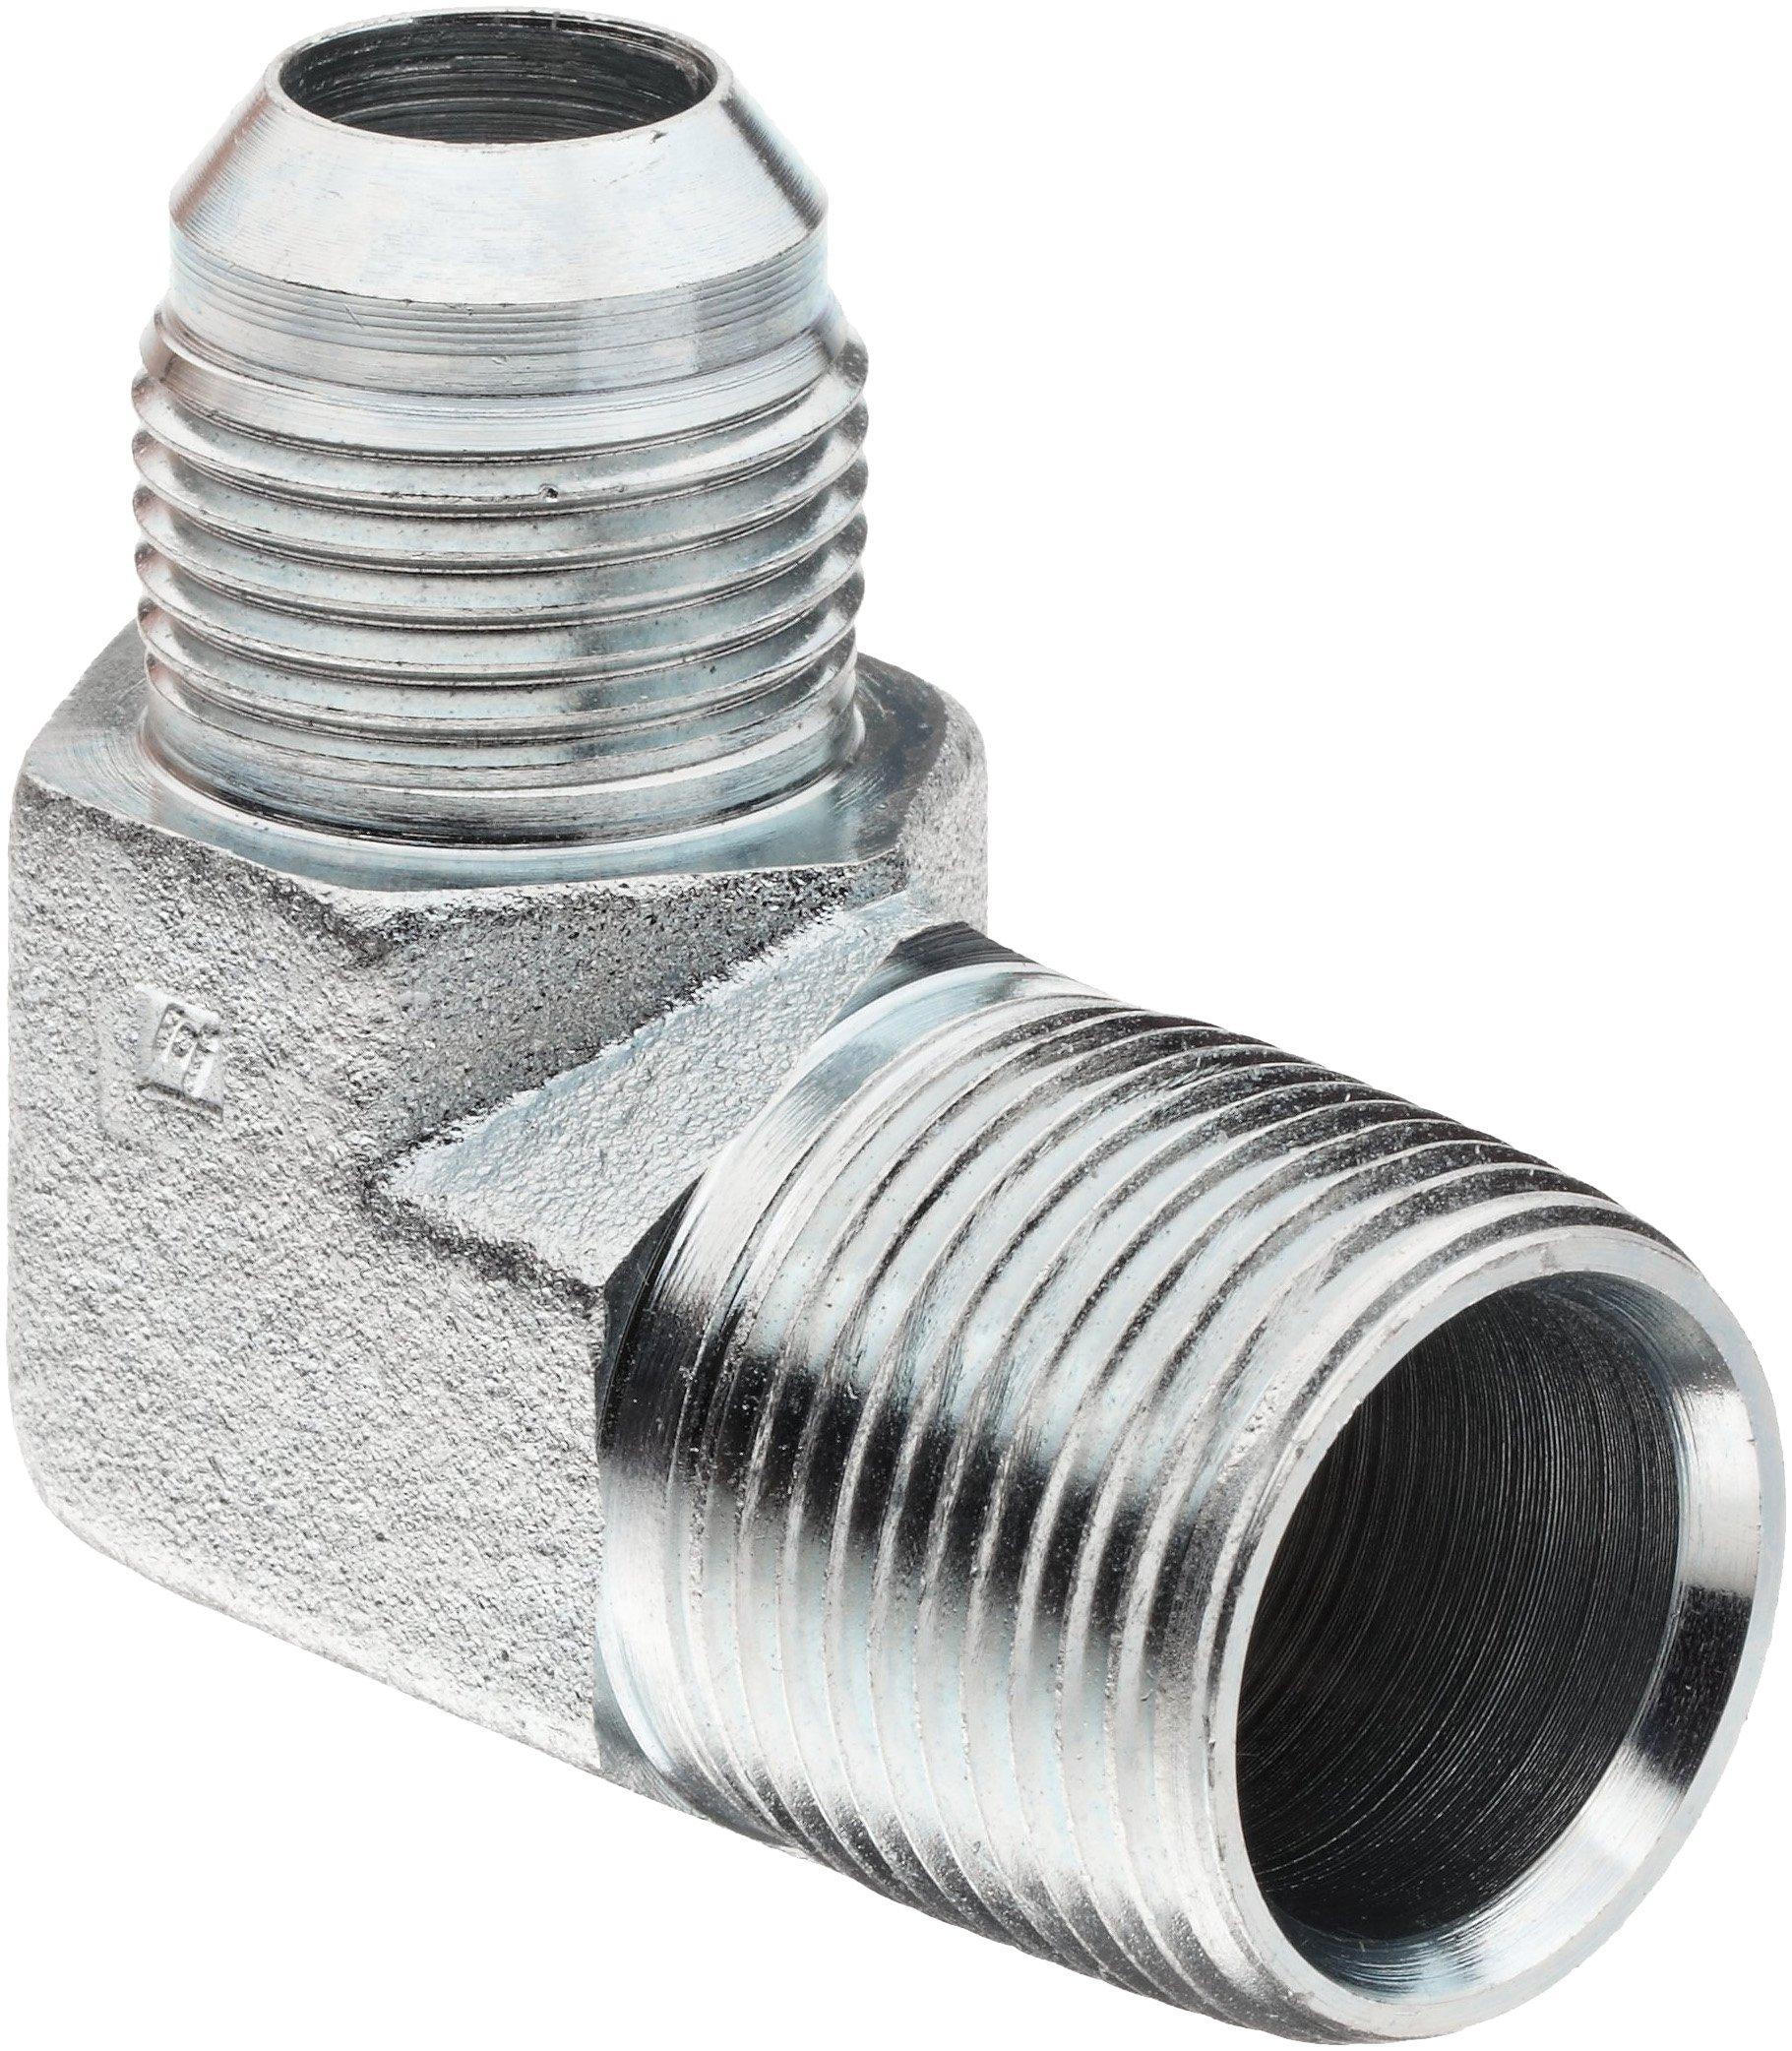 Brennan 2501-24-24-FG Forged Steel JIC Flared Tube Fitting, 90 Degree Elbow Forgeded, 1-1/2'' Tube OD JIC Male x 1-1/2-11-1/2 NPTF Male